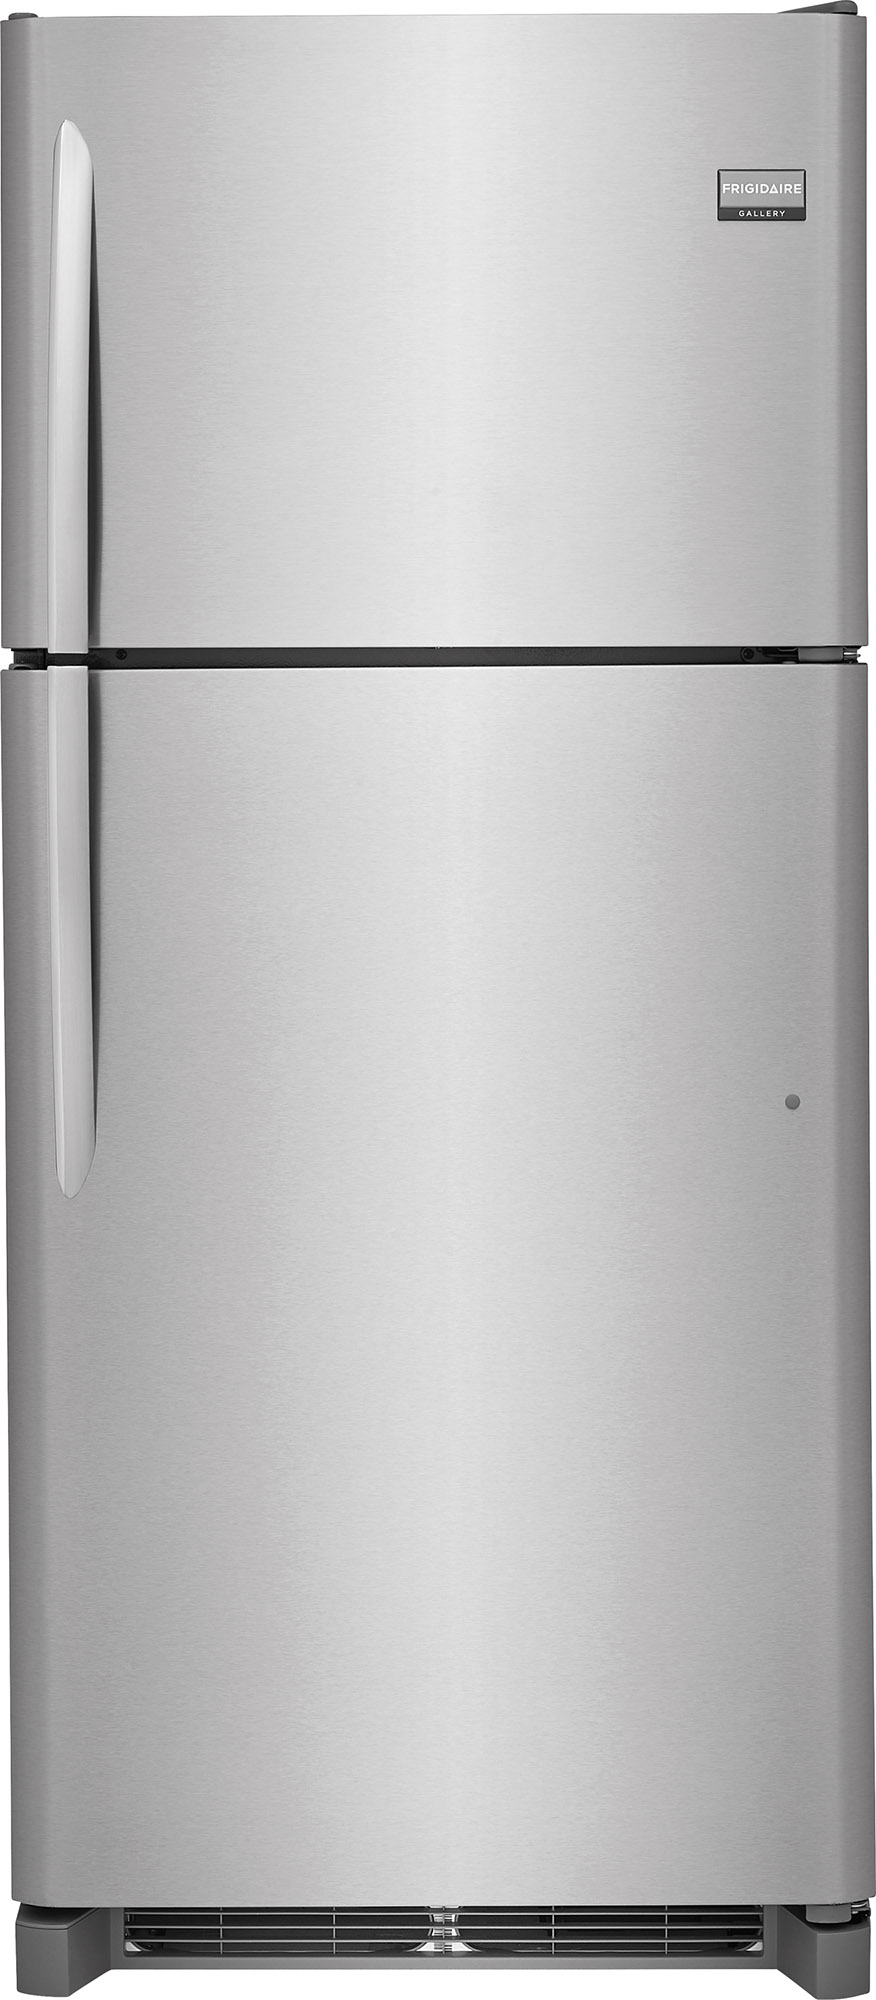 Frigidaire Refrigerator Model Fgtr1845qf2 Parts Amp Repair